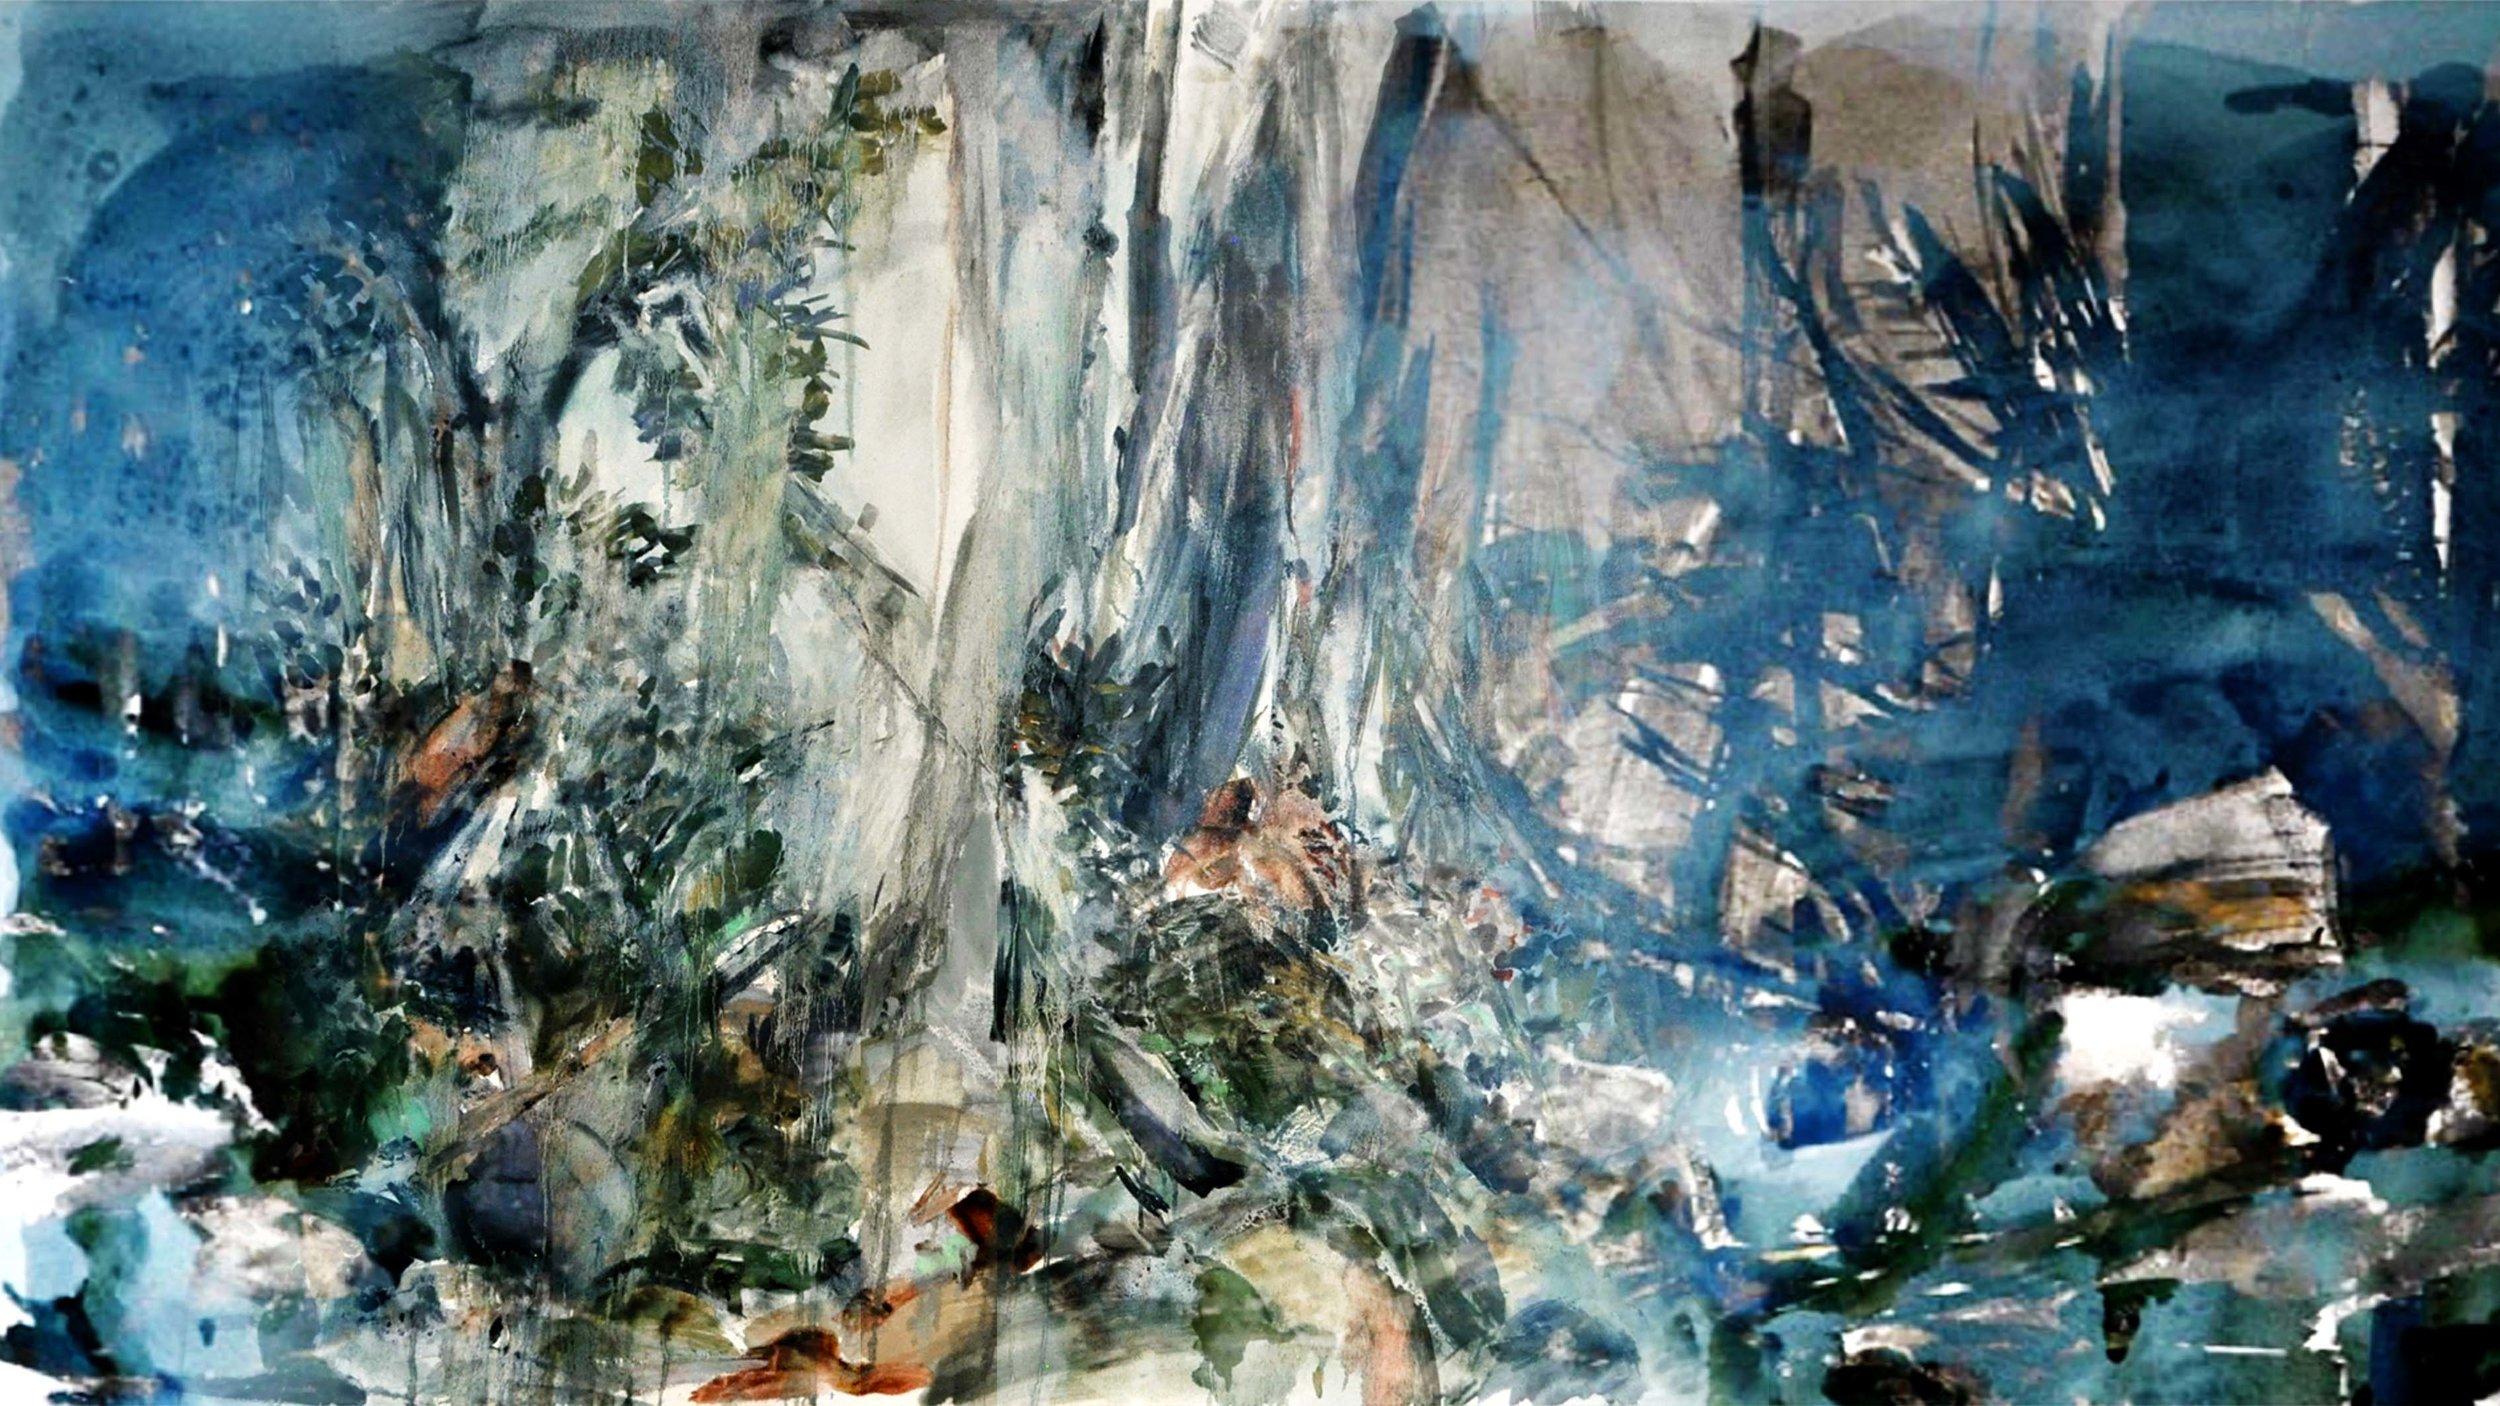 Marais 2, digital painting, dimensions variable, 2016